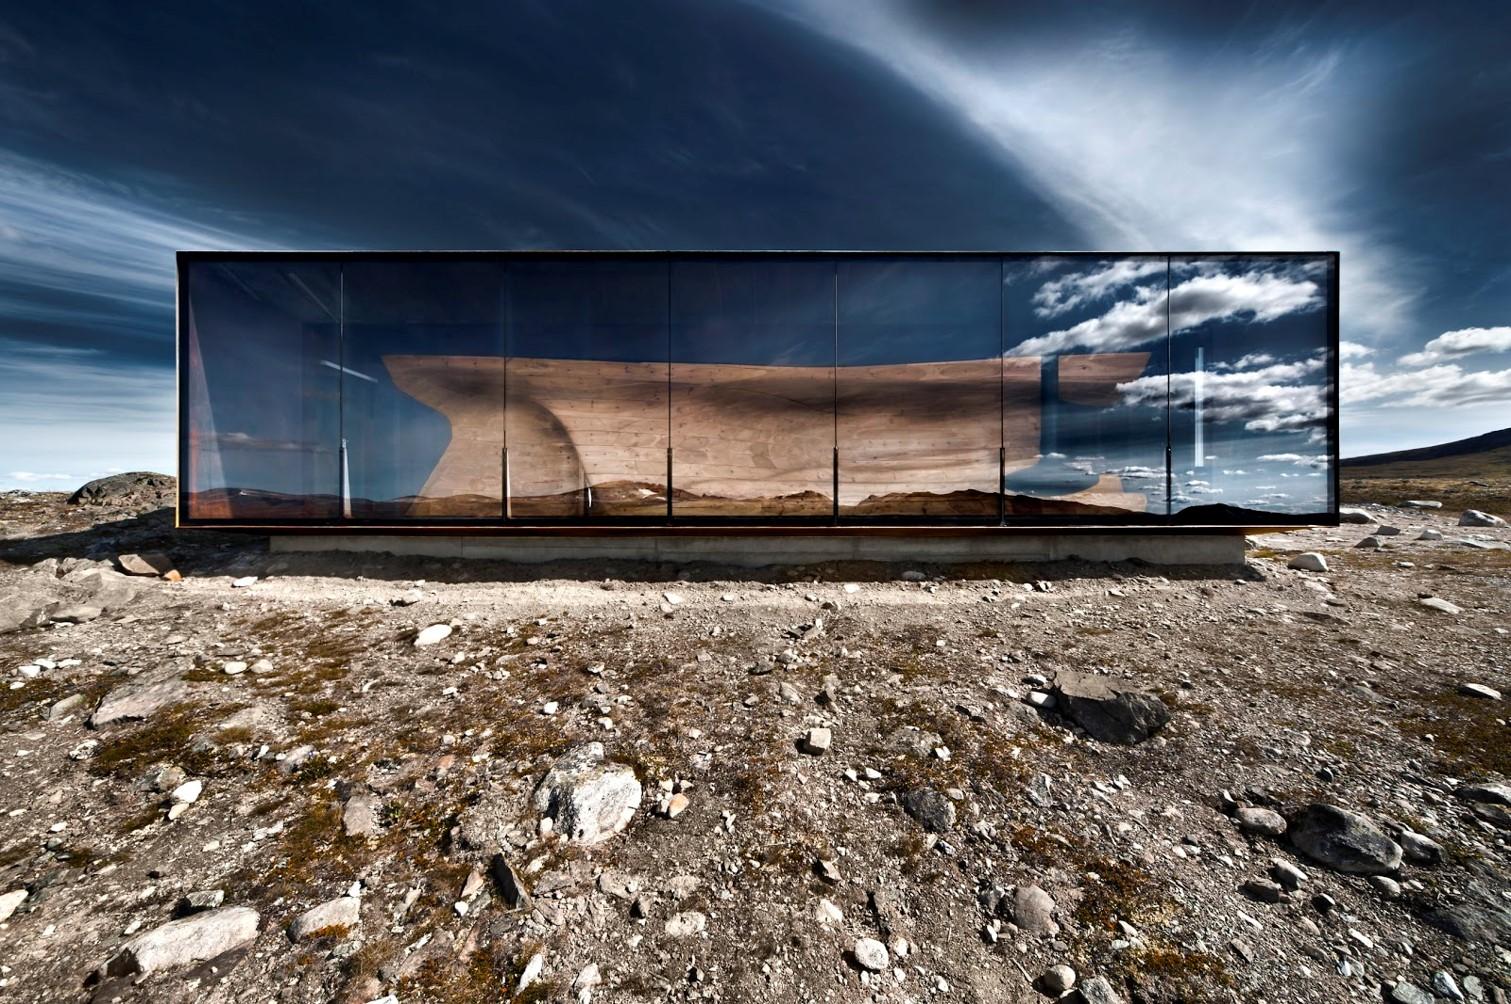 Rentier-Beobachtungsstation Tverrfjellhytta, Norwegen